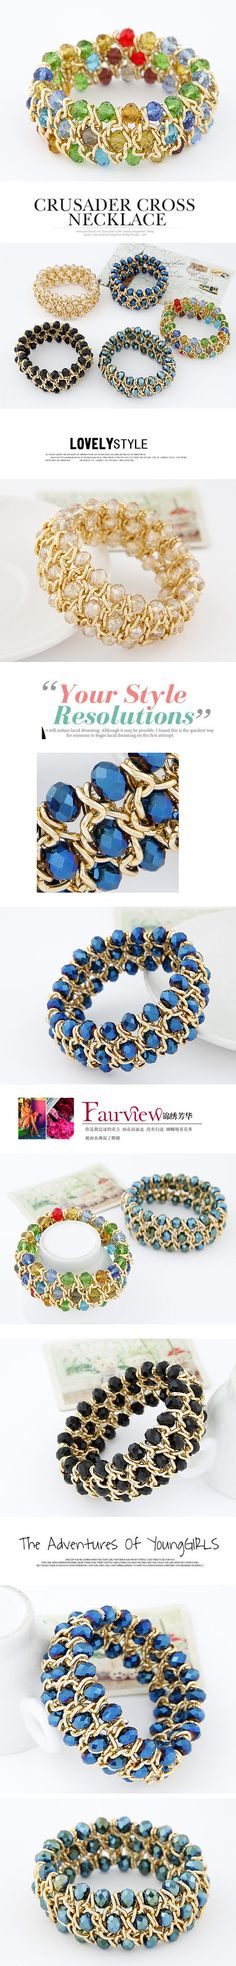 Wholesale Fácil partido cristal elegante tejida brazalete elástico (azul real) | Callesetas